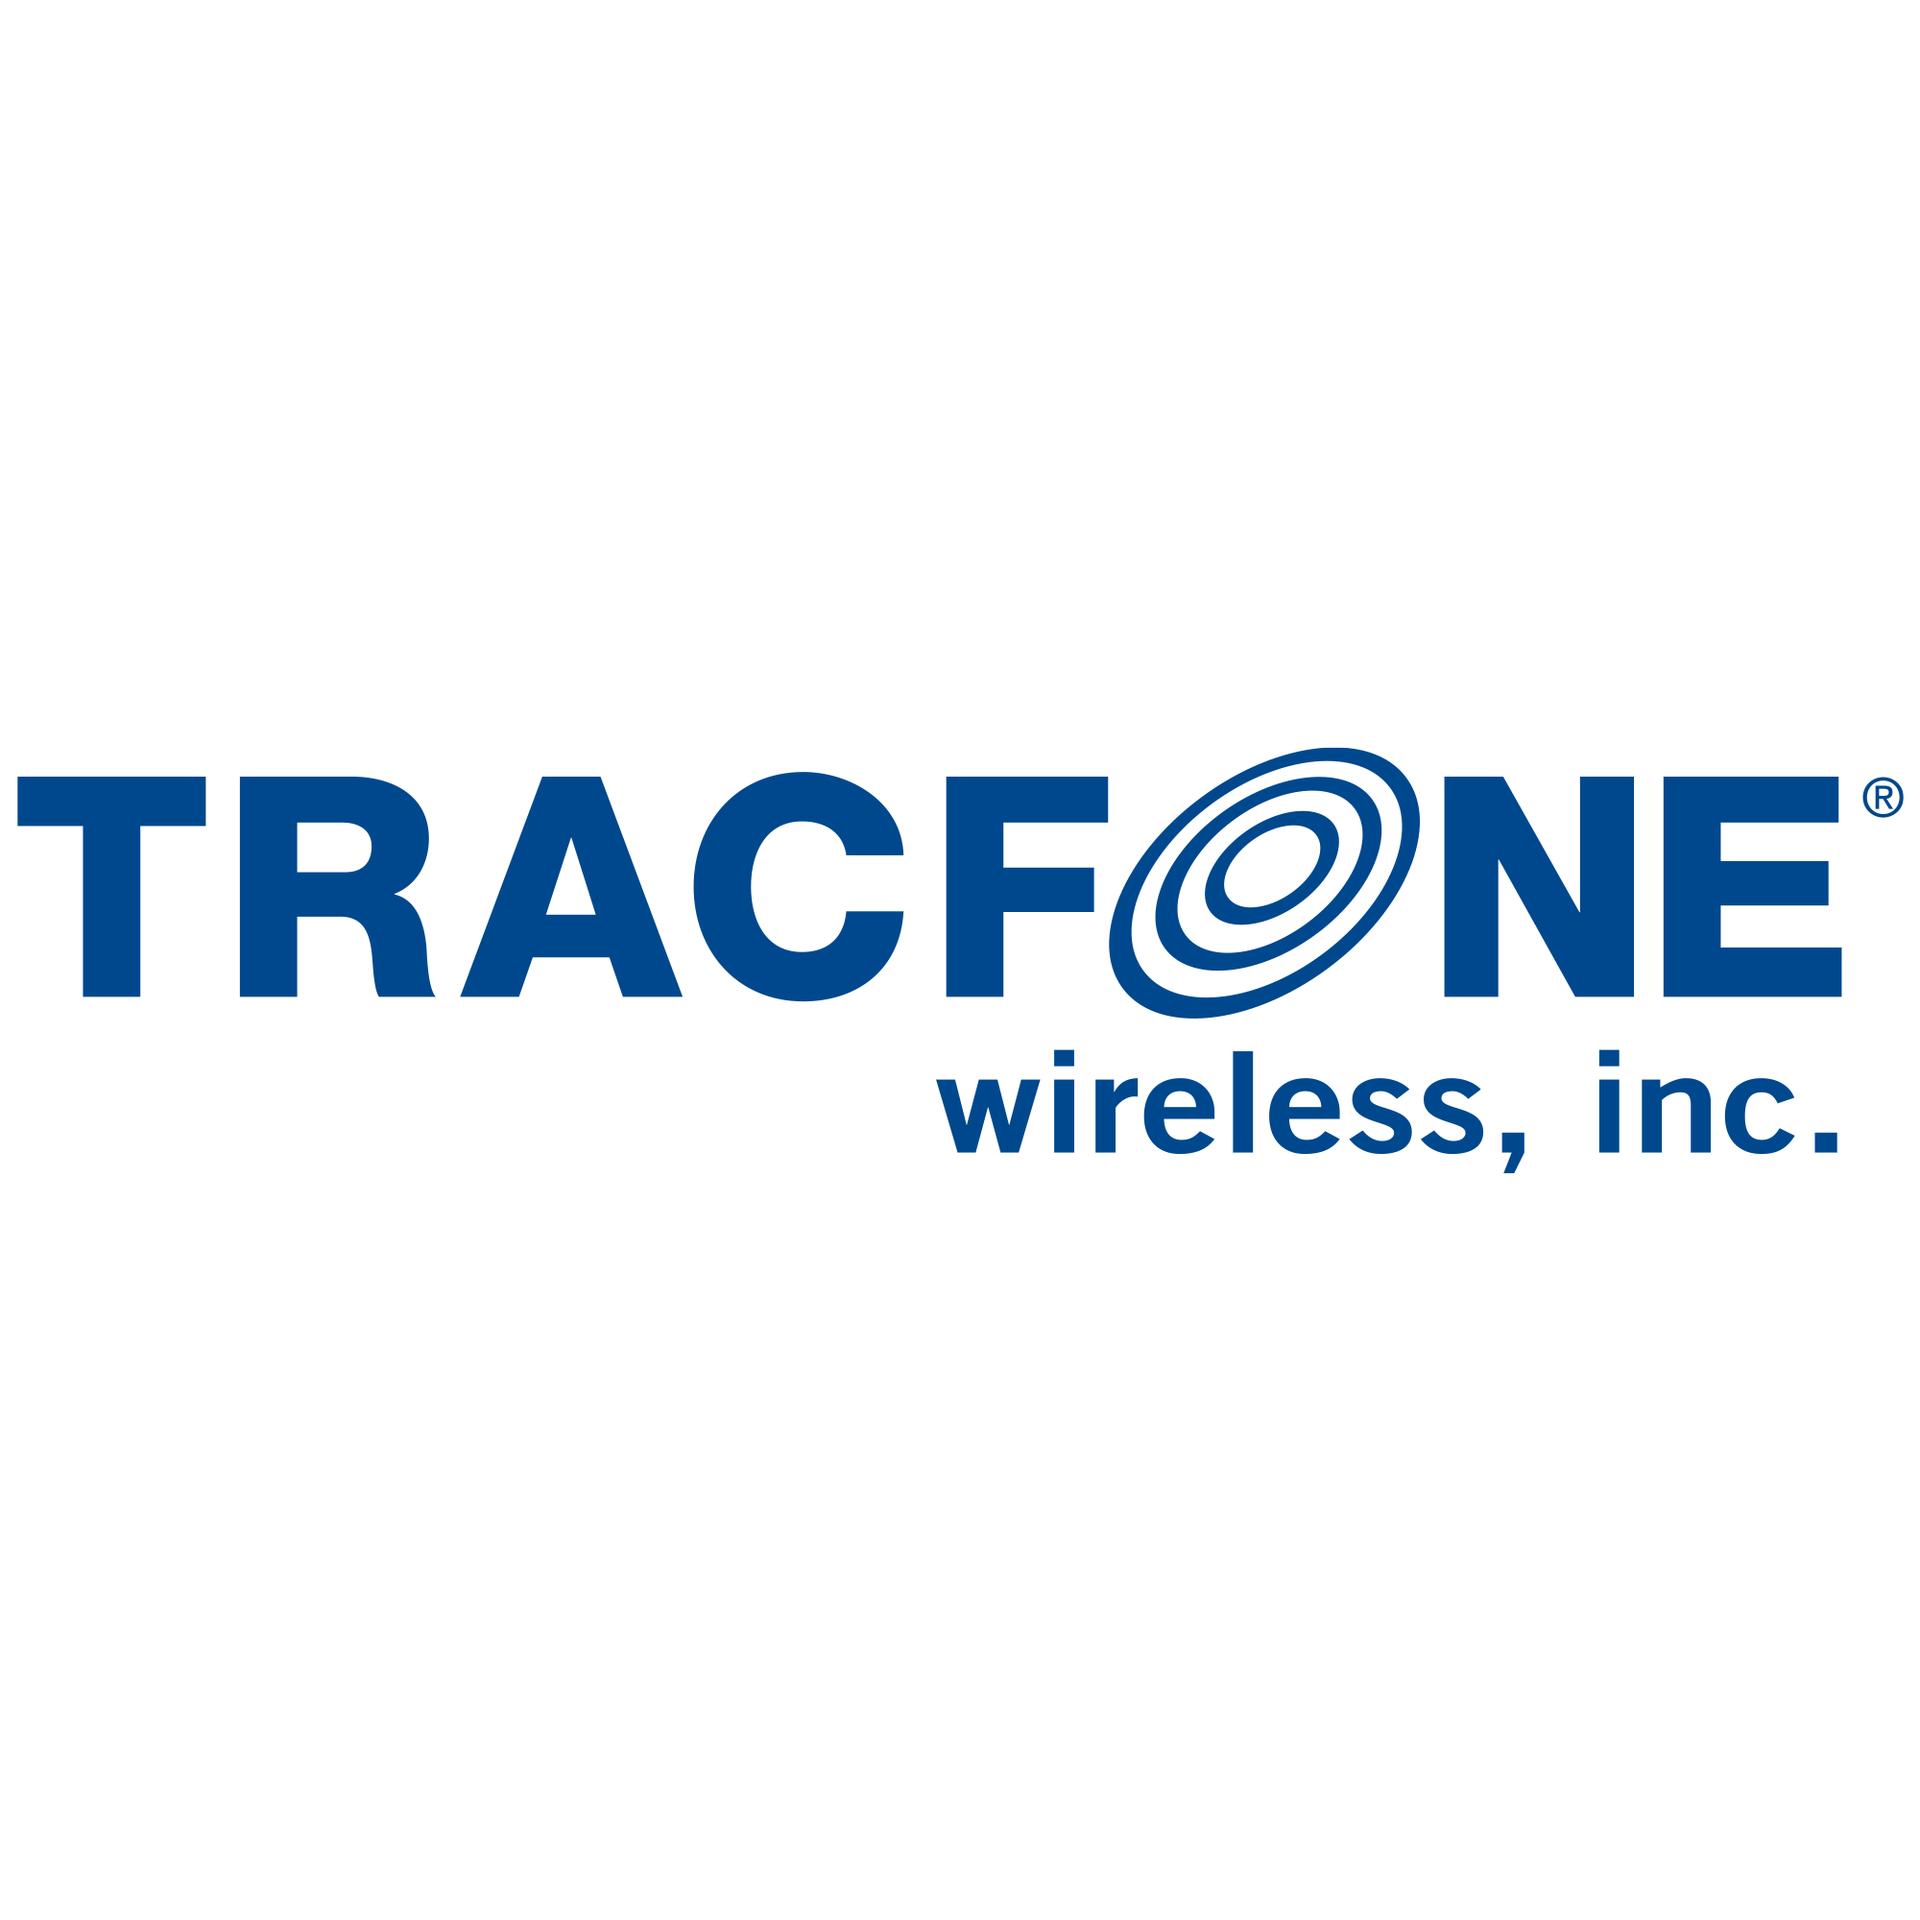 Tracfone Wireless Logo 4